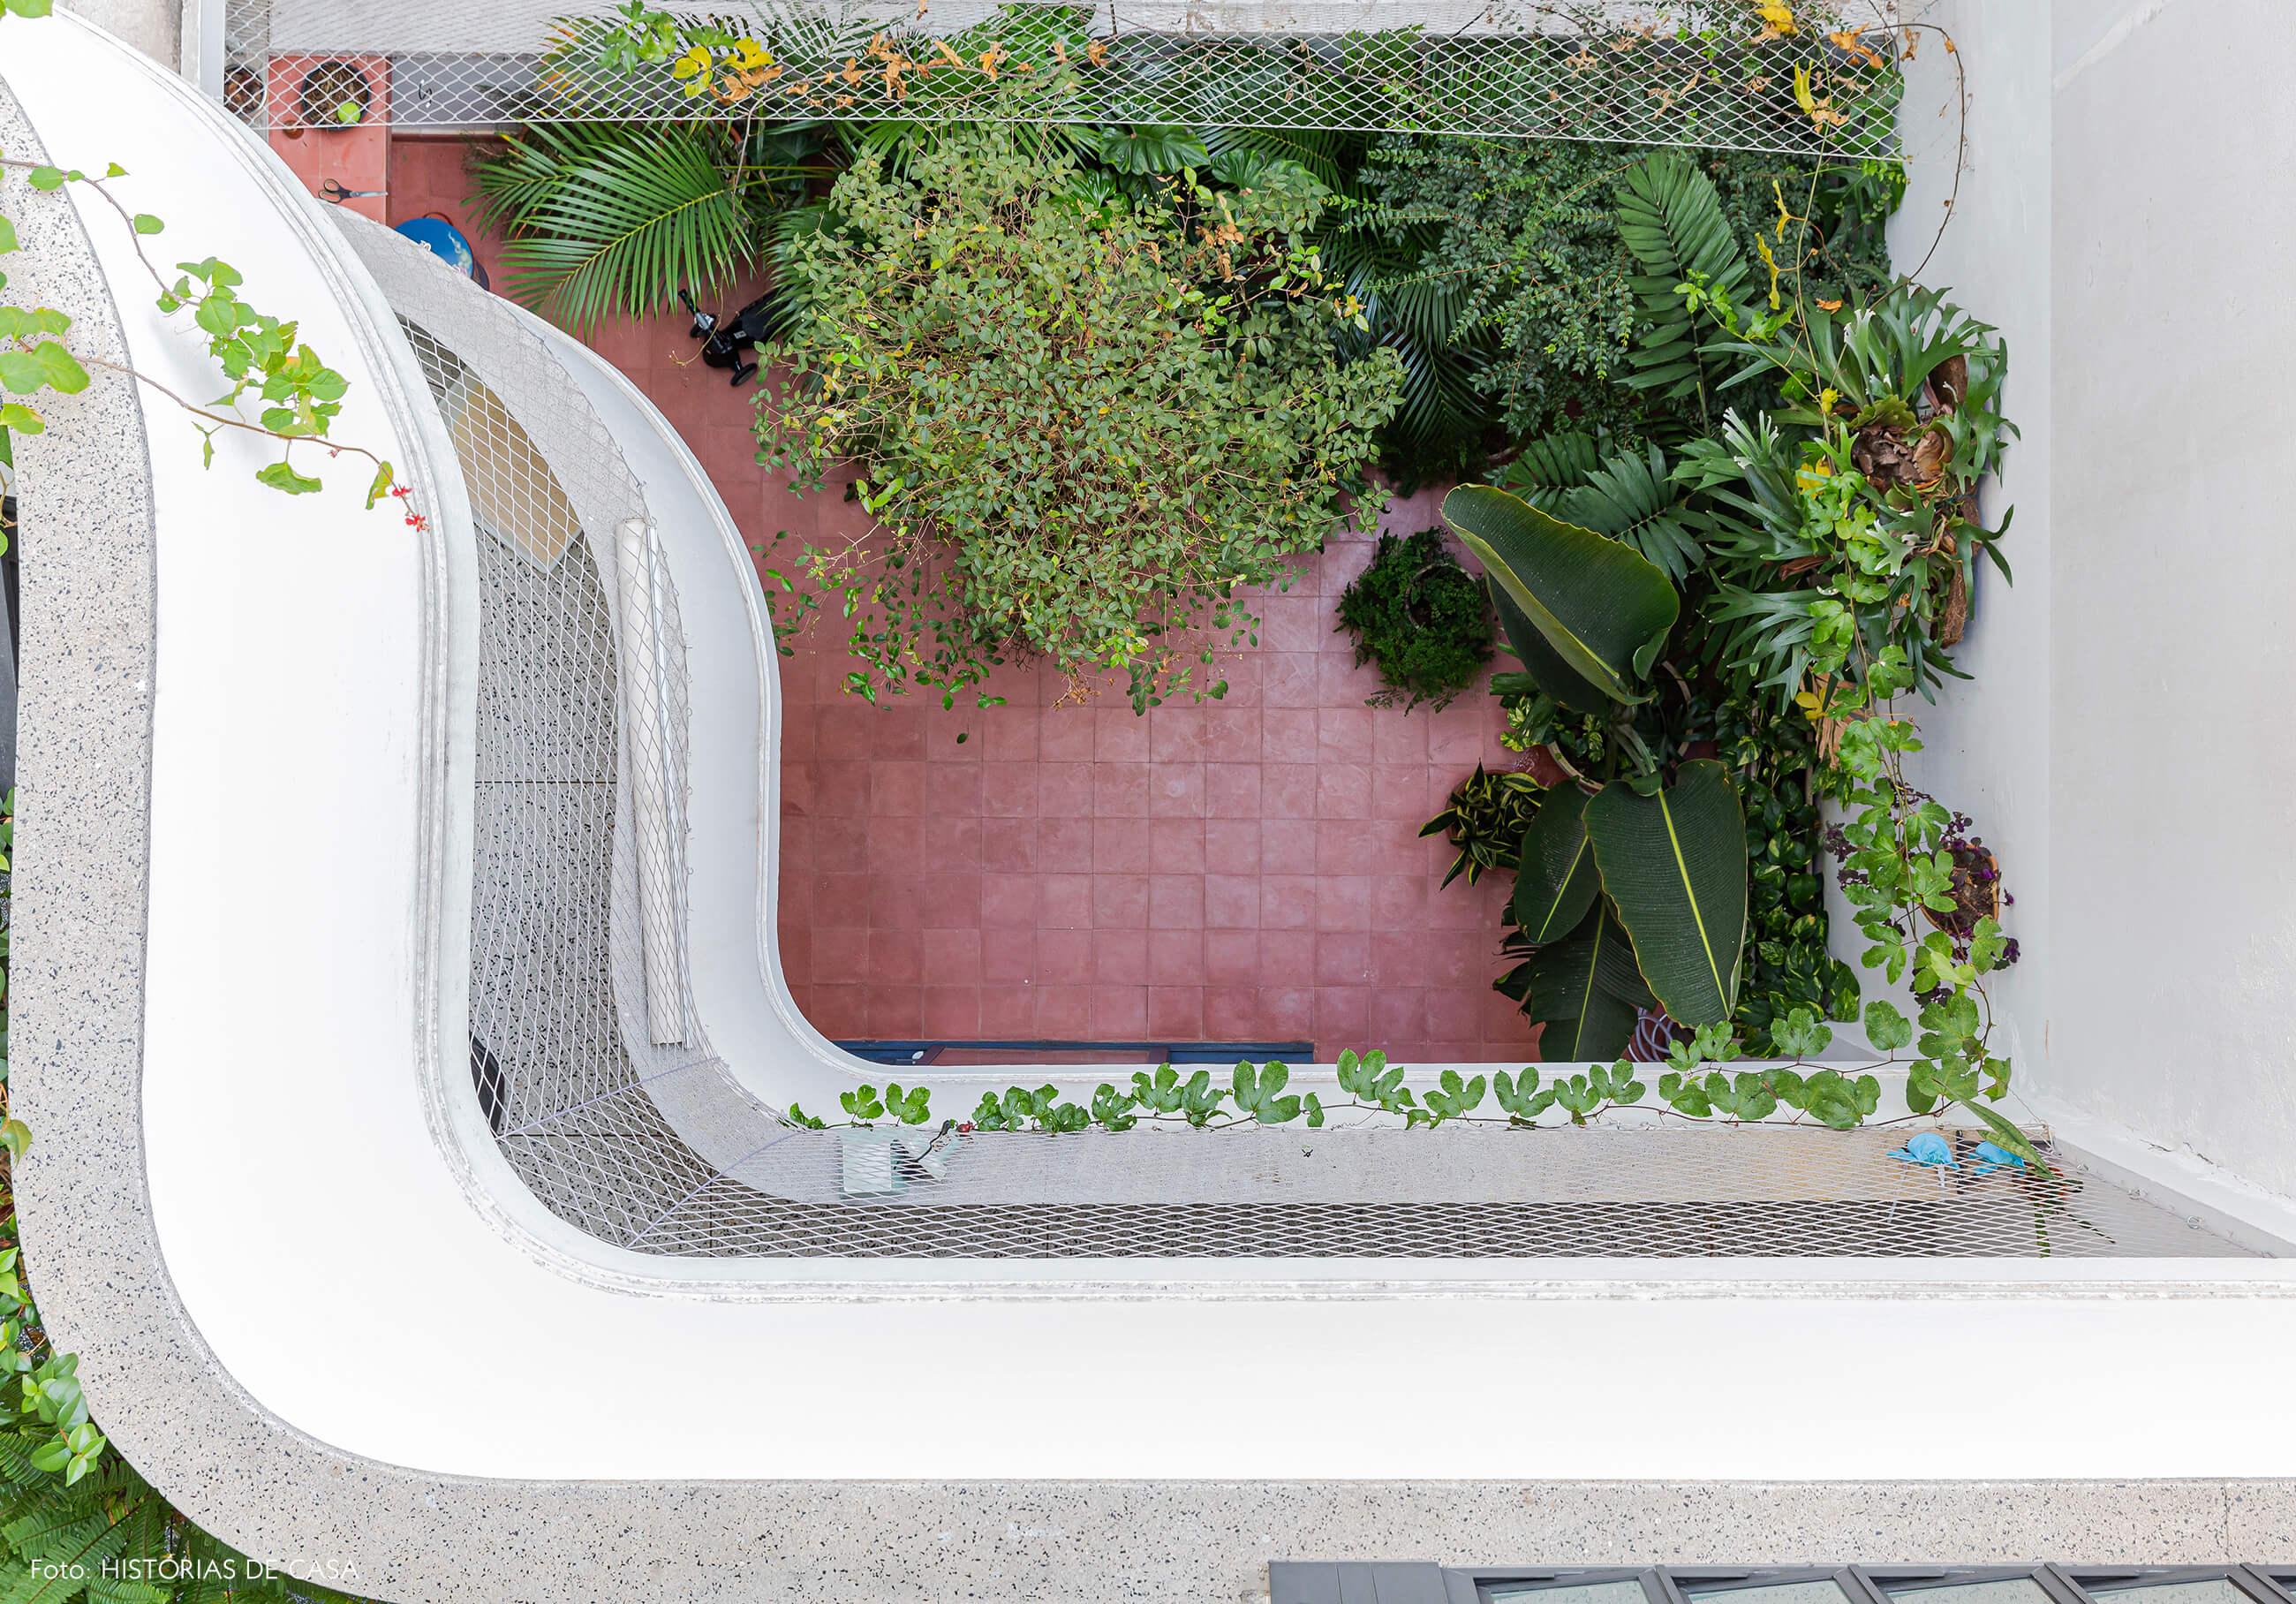 Apartamento térreo com jardim e plantas, piso de ladrilhos hidráulicos